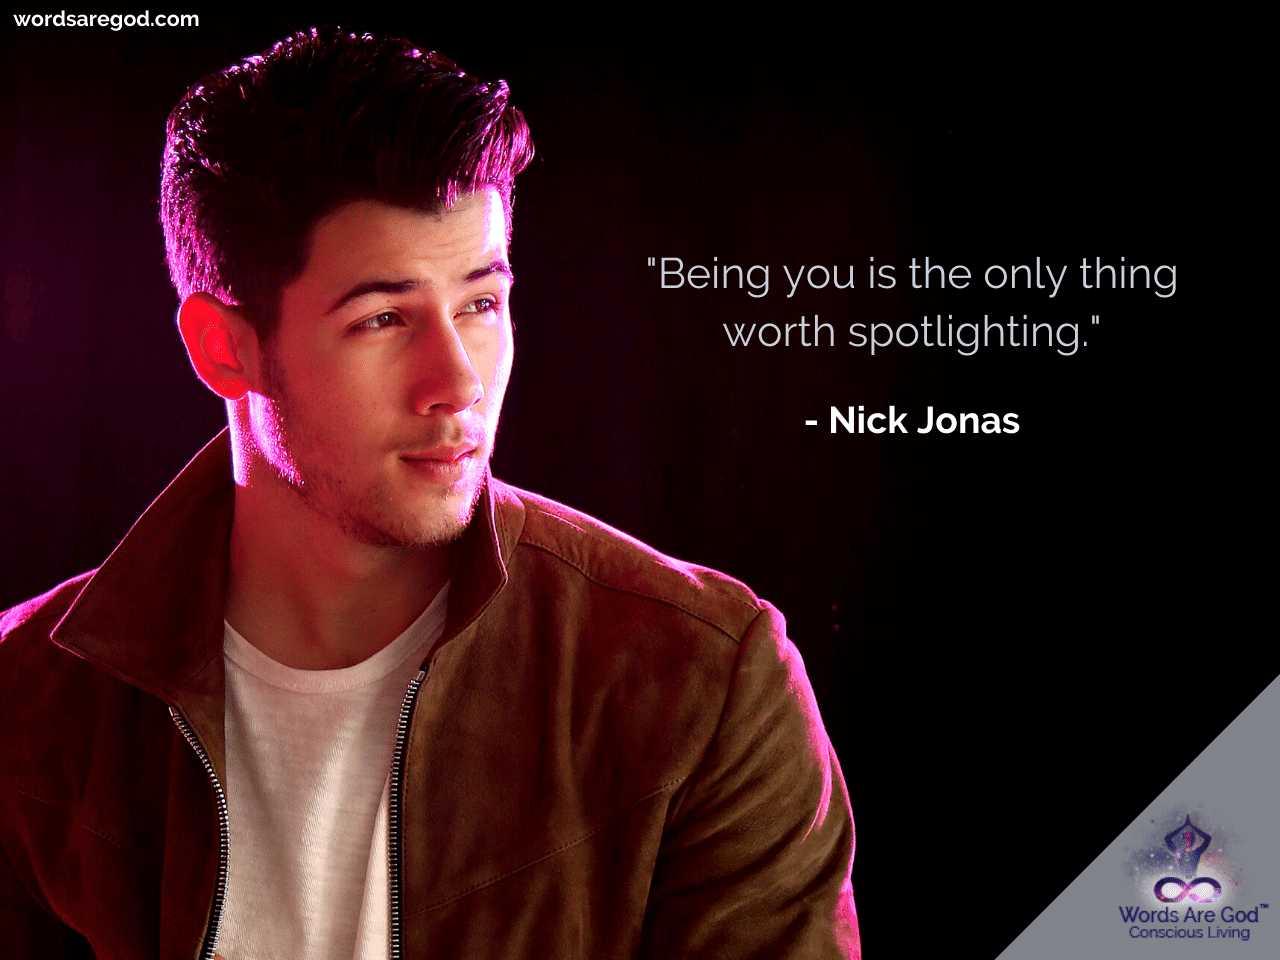 Nick Jonas Inspirational Quote